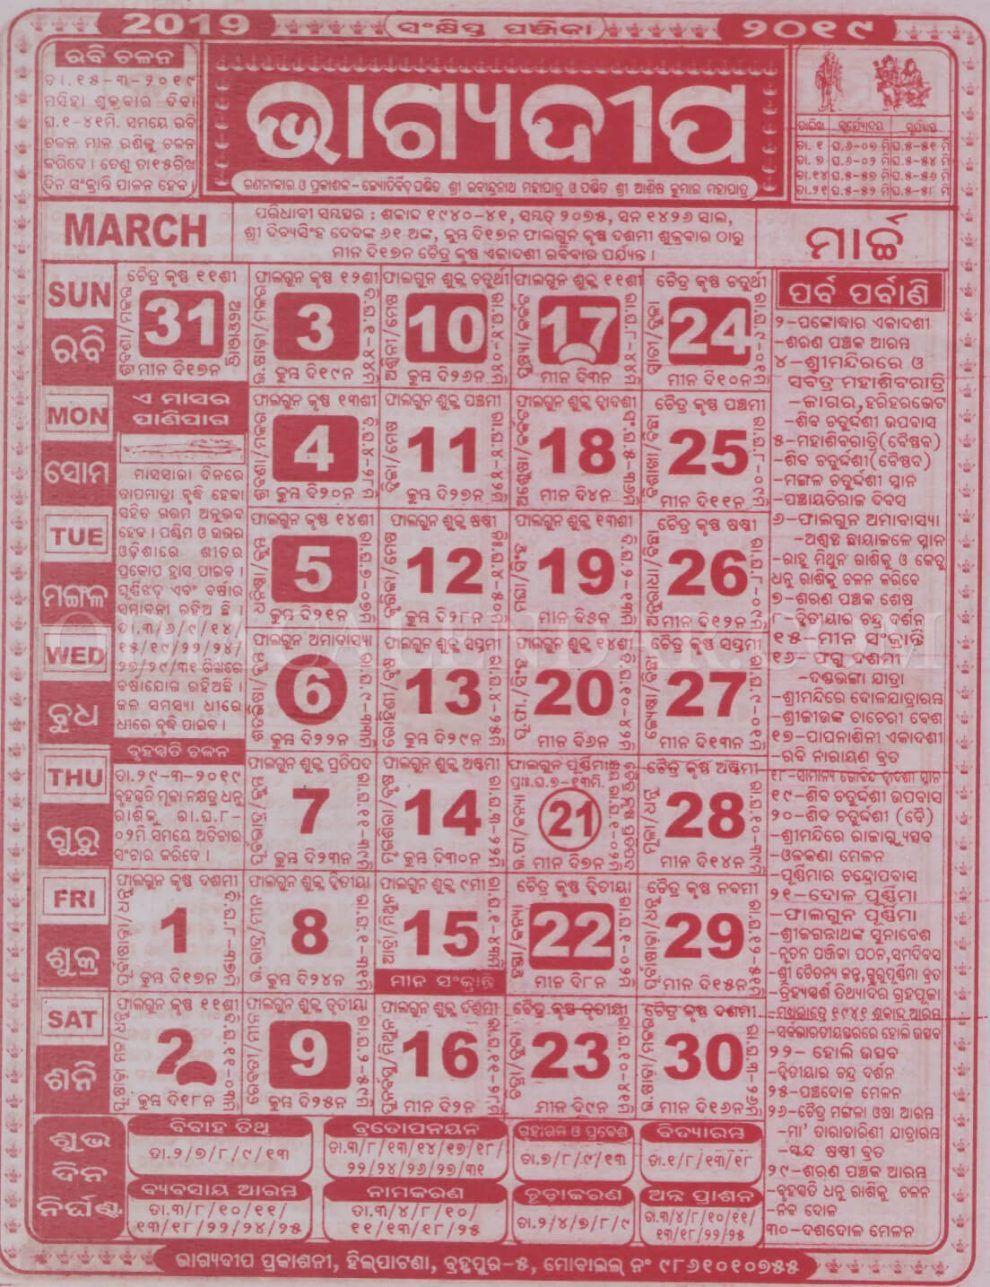 Bhagyadeep Odia Calendar 2019 – Free Odia Panjika (App Book with regard to Oriya Calendar 2020 February